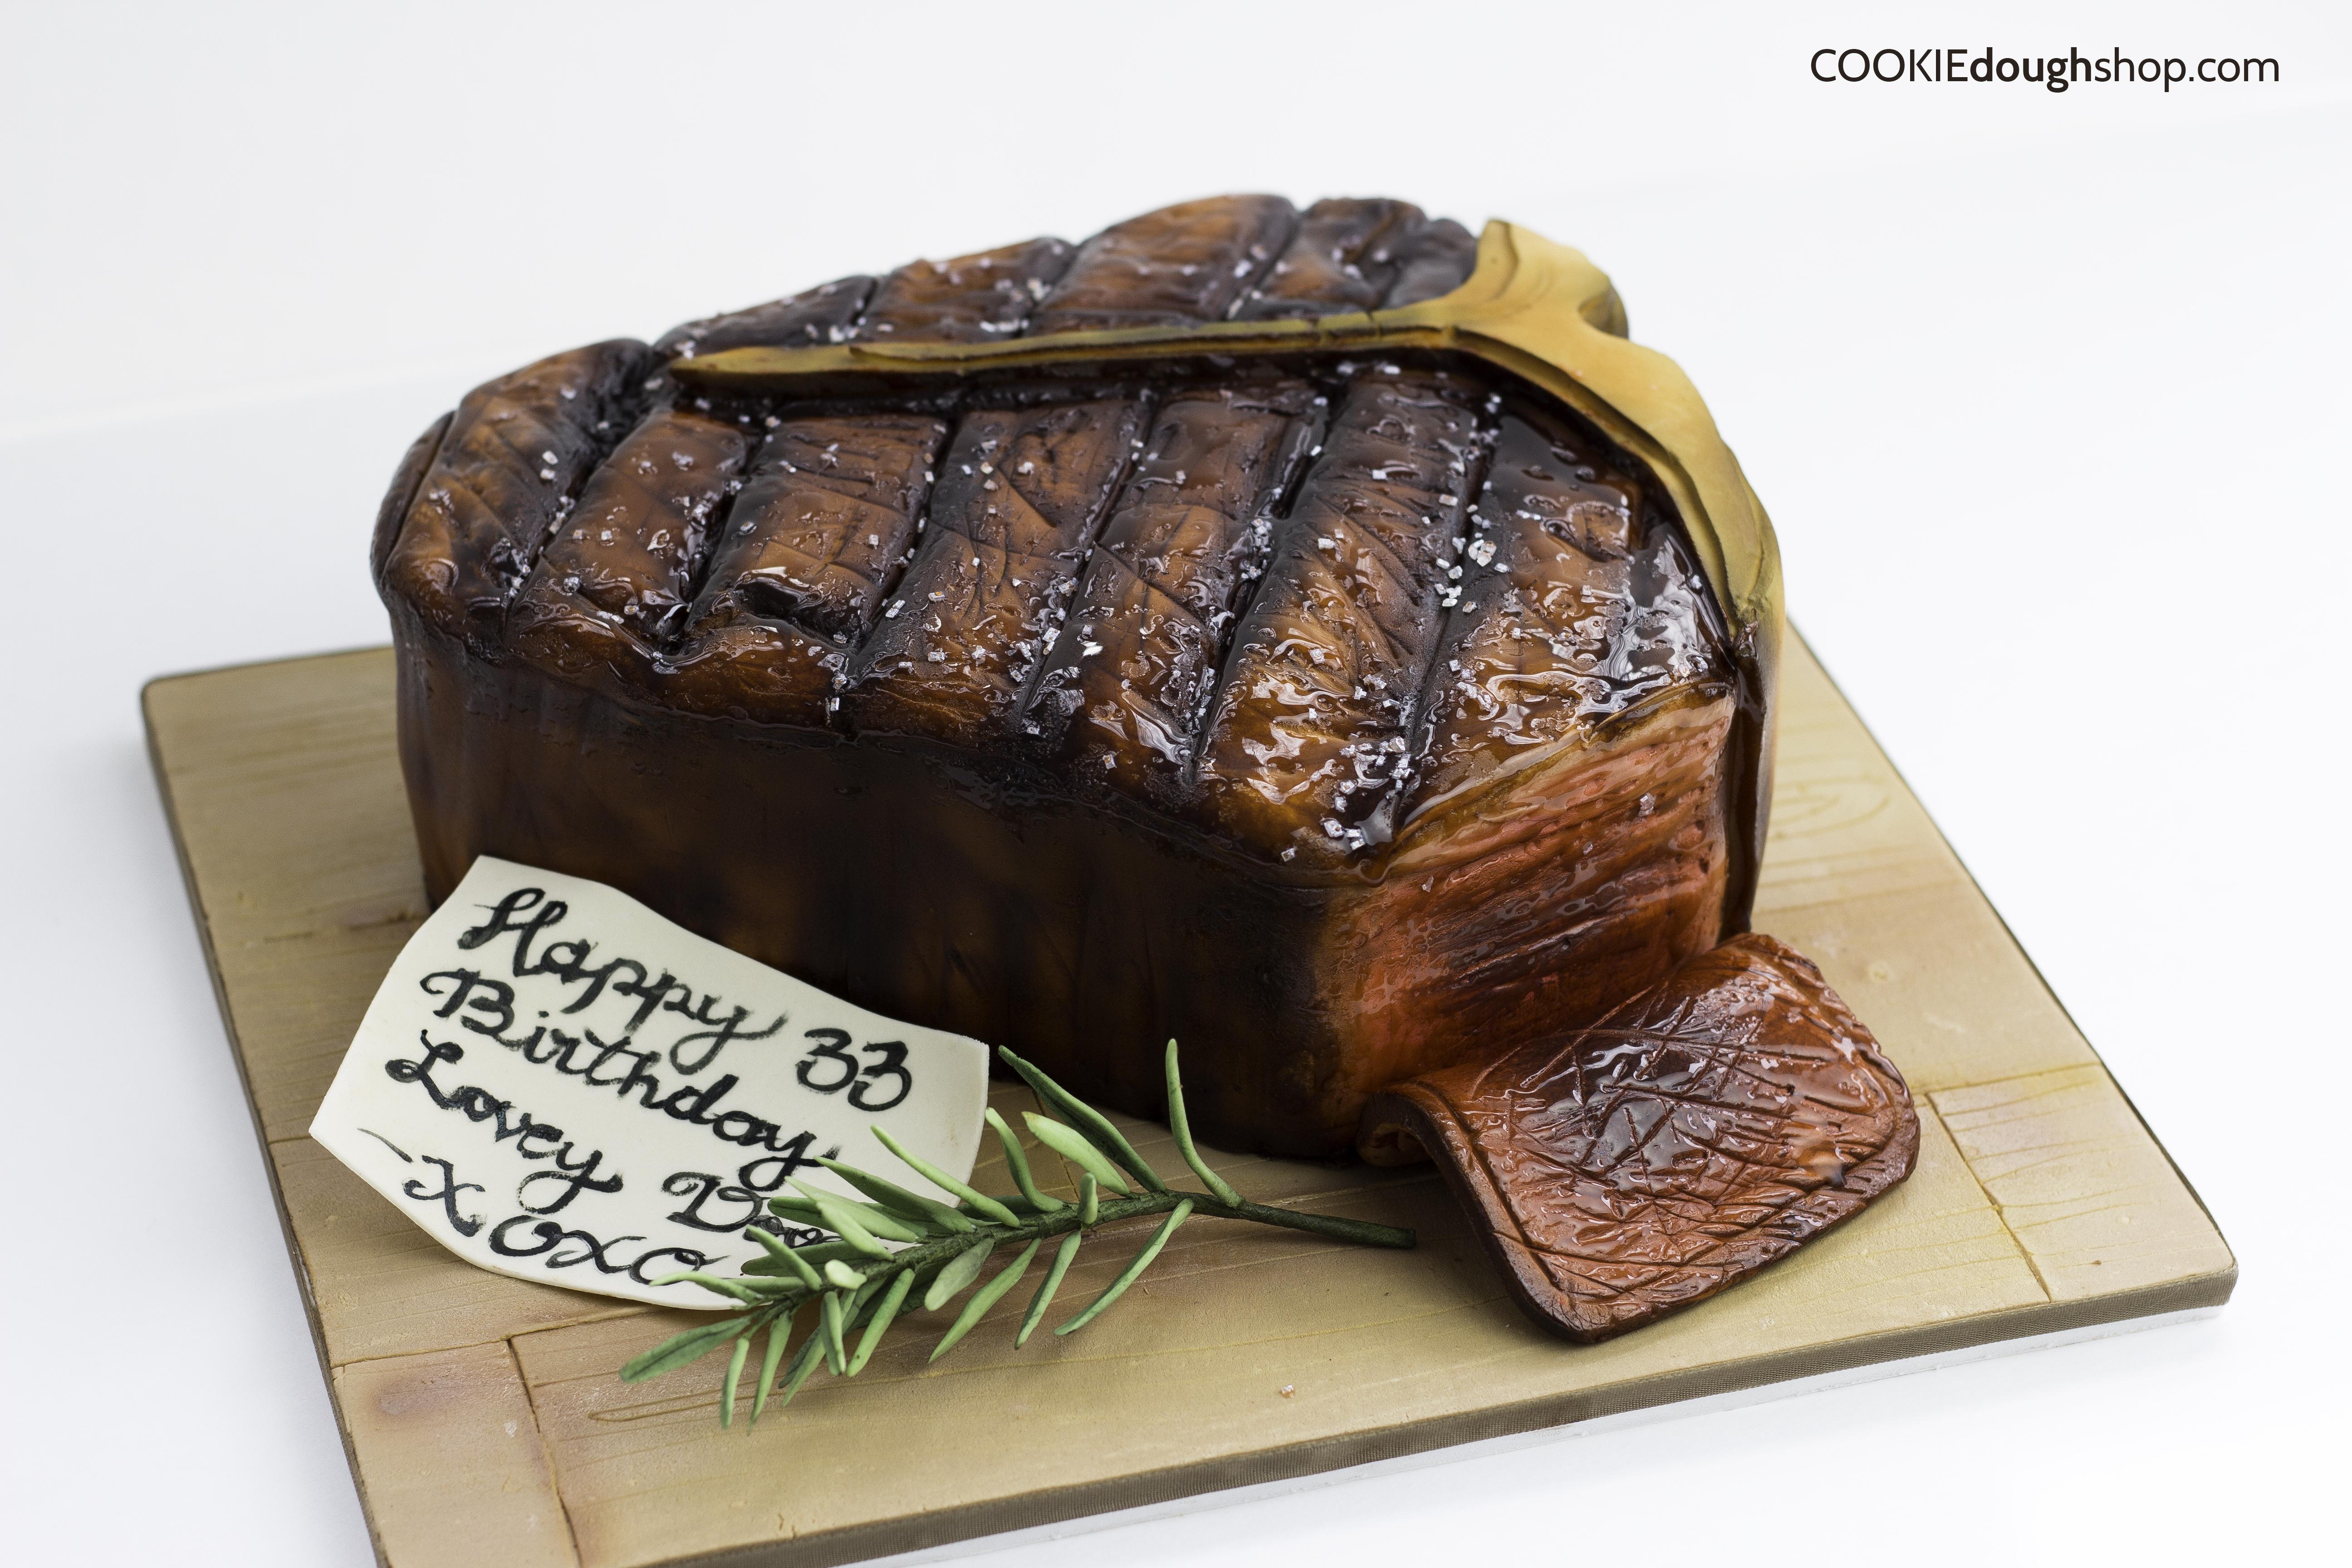 Porterhouse steak cake